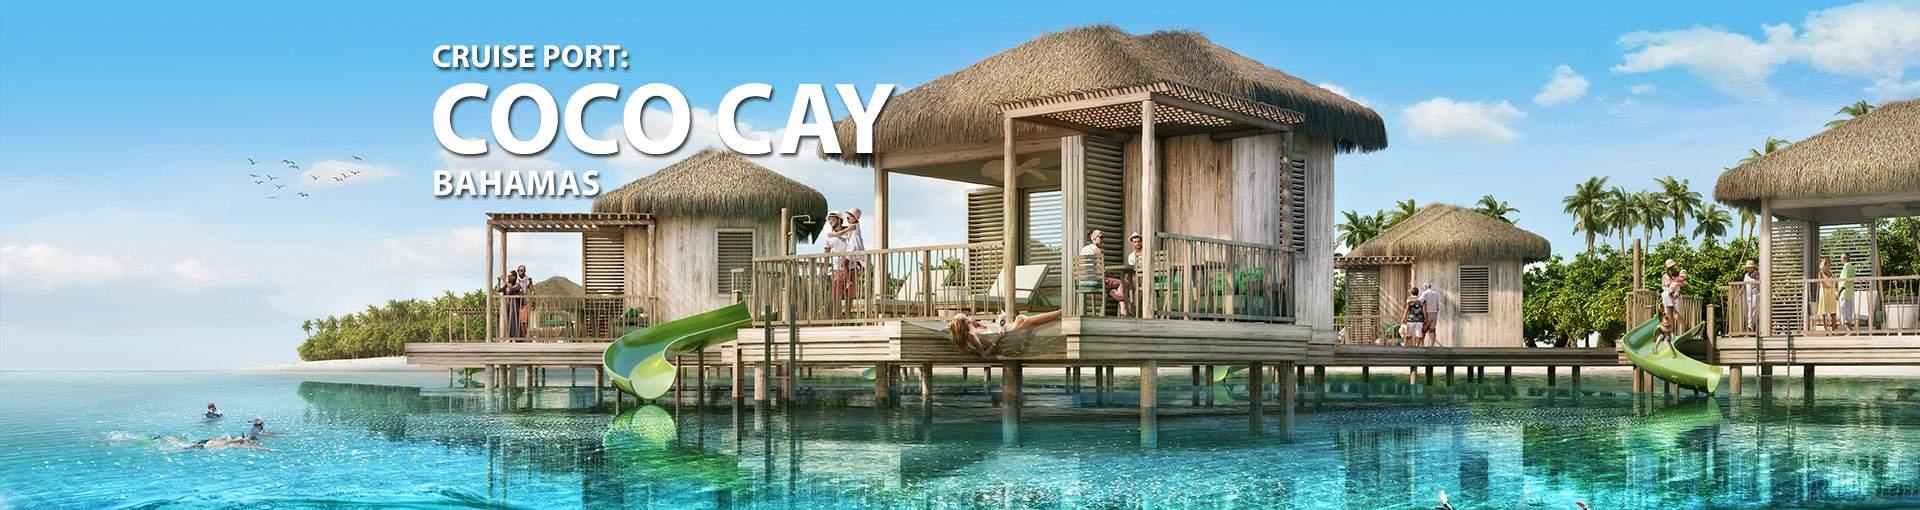 Cruise Port CocoCay Bahamas